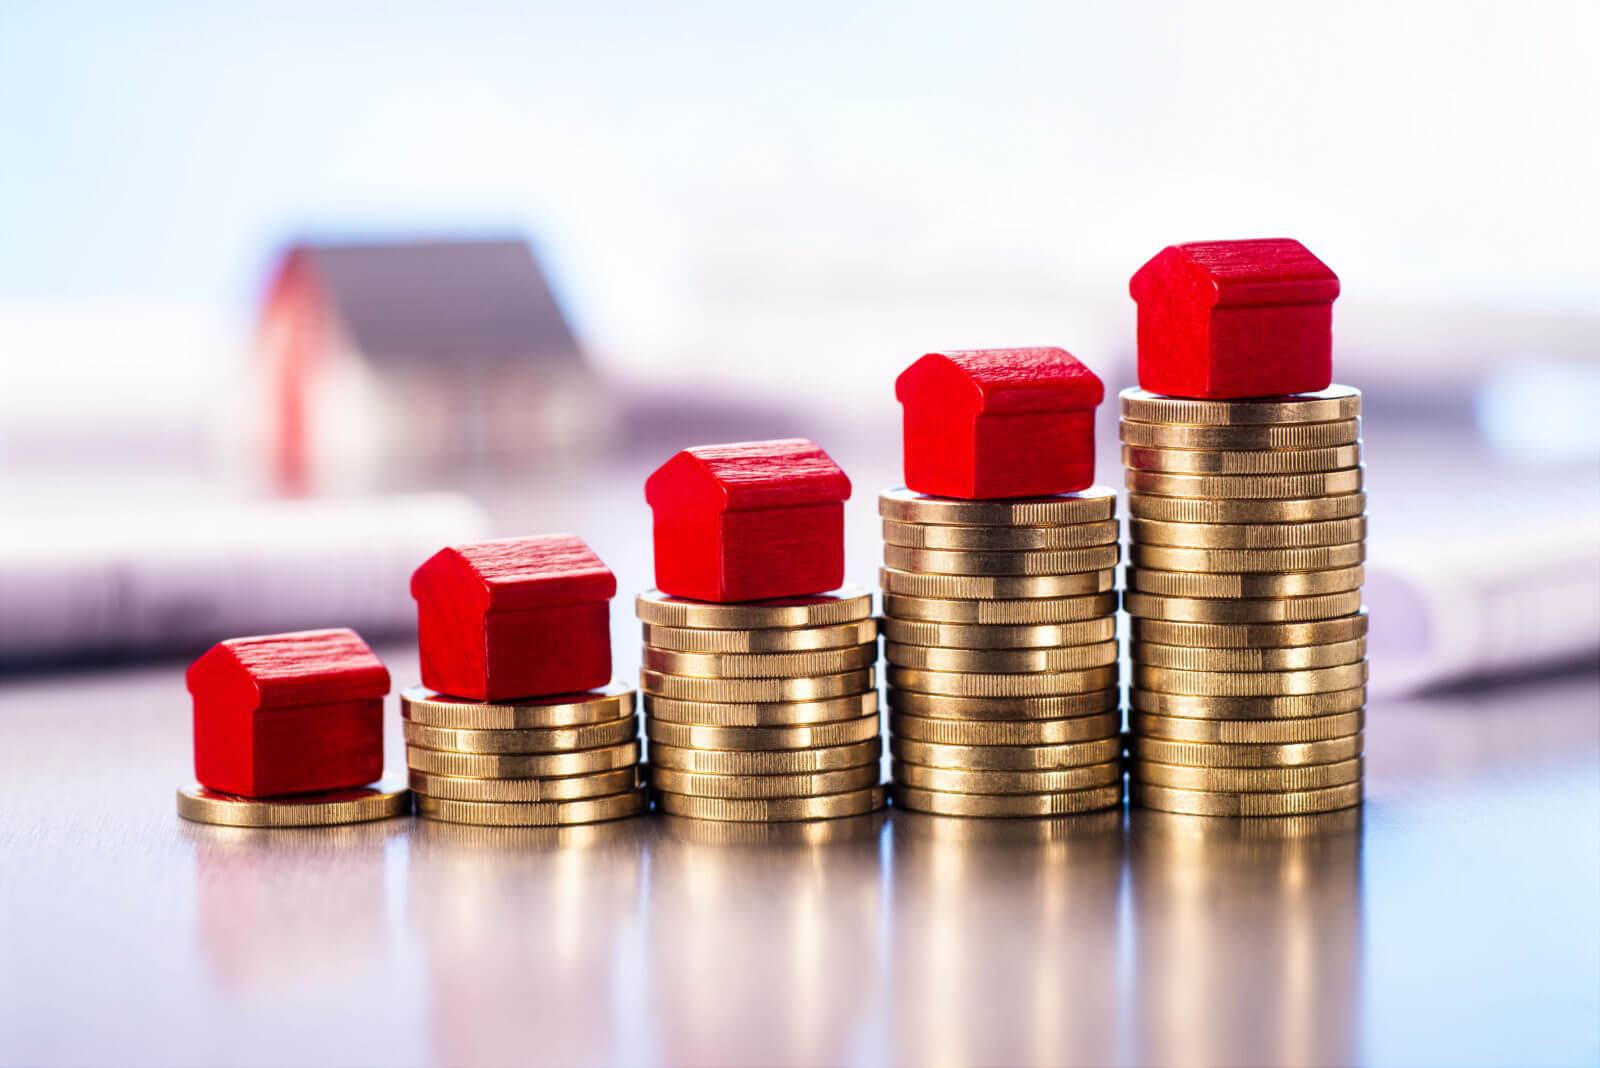 Financement immobilier reduit